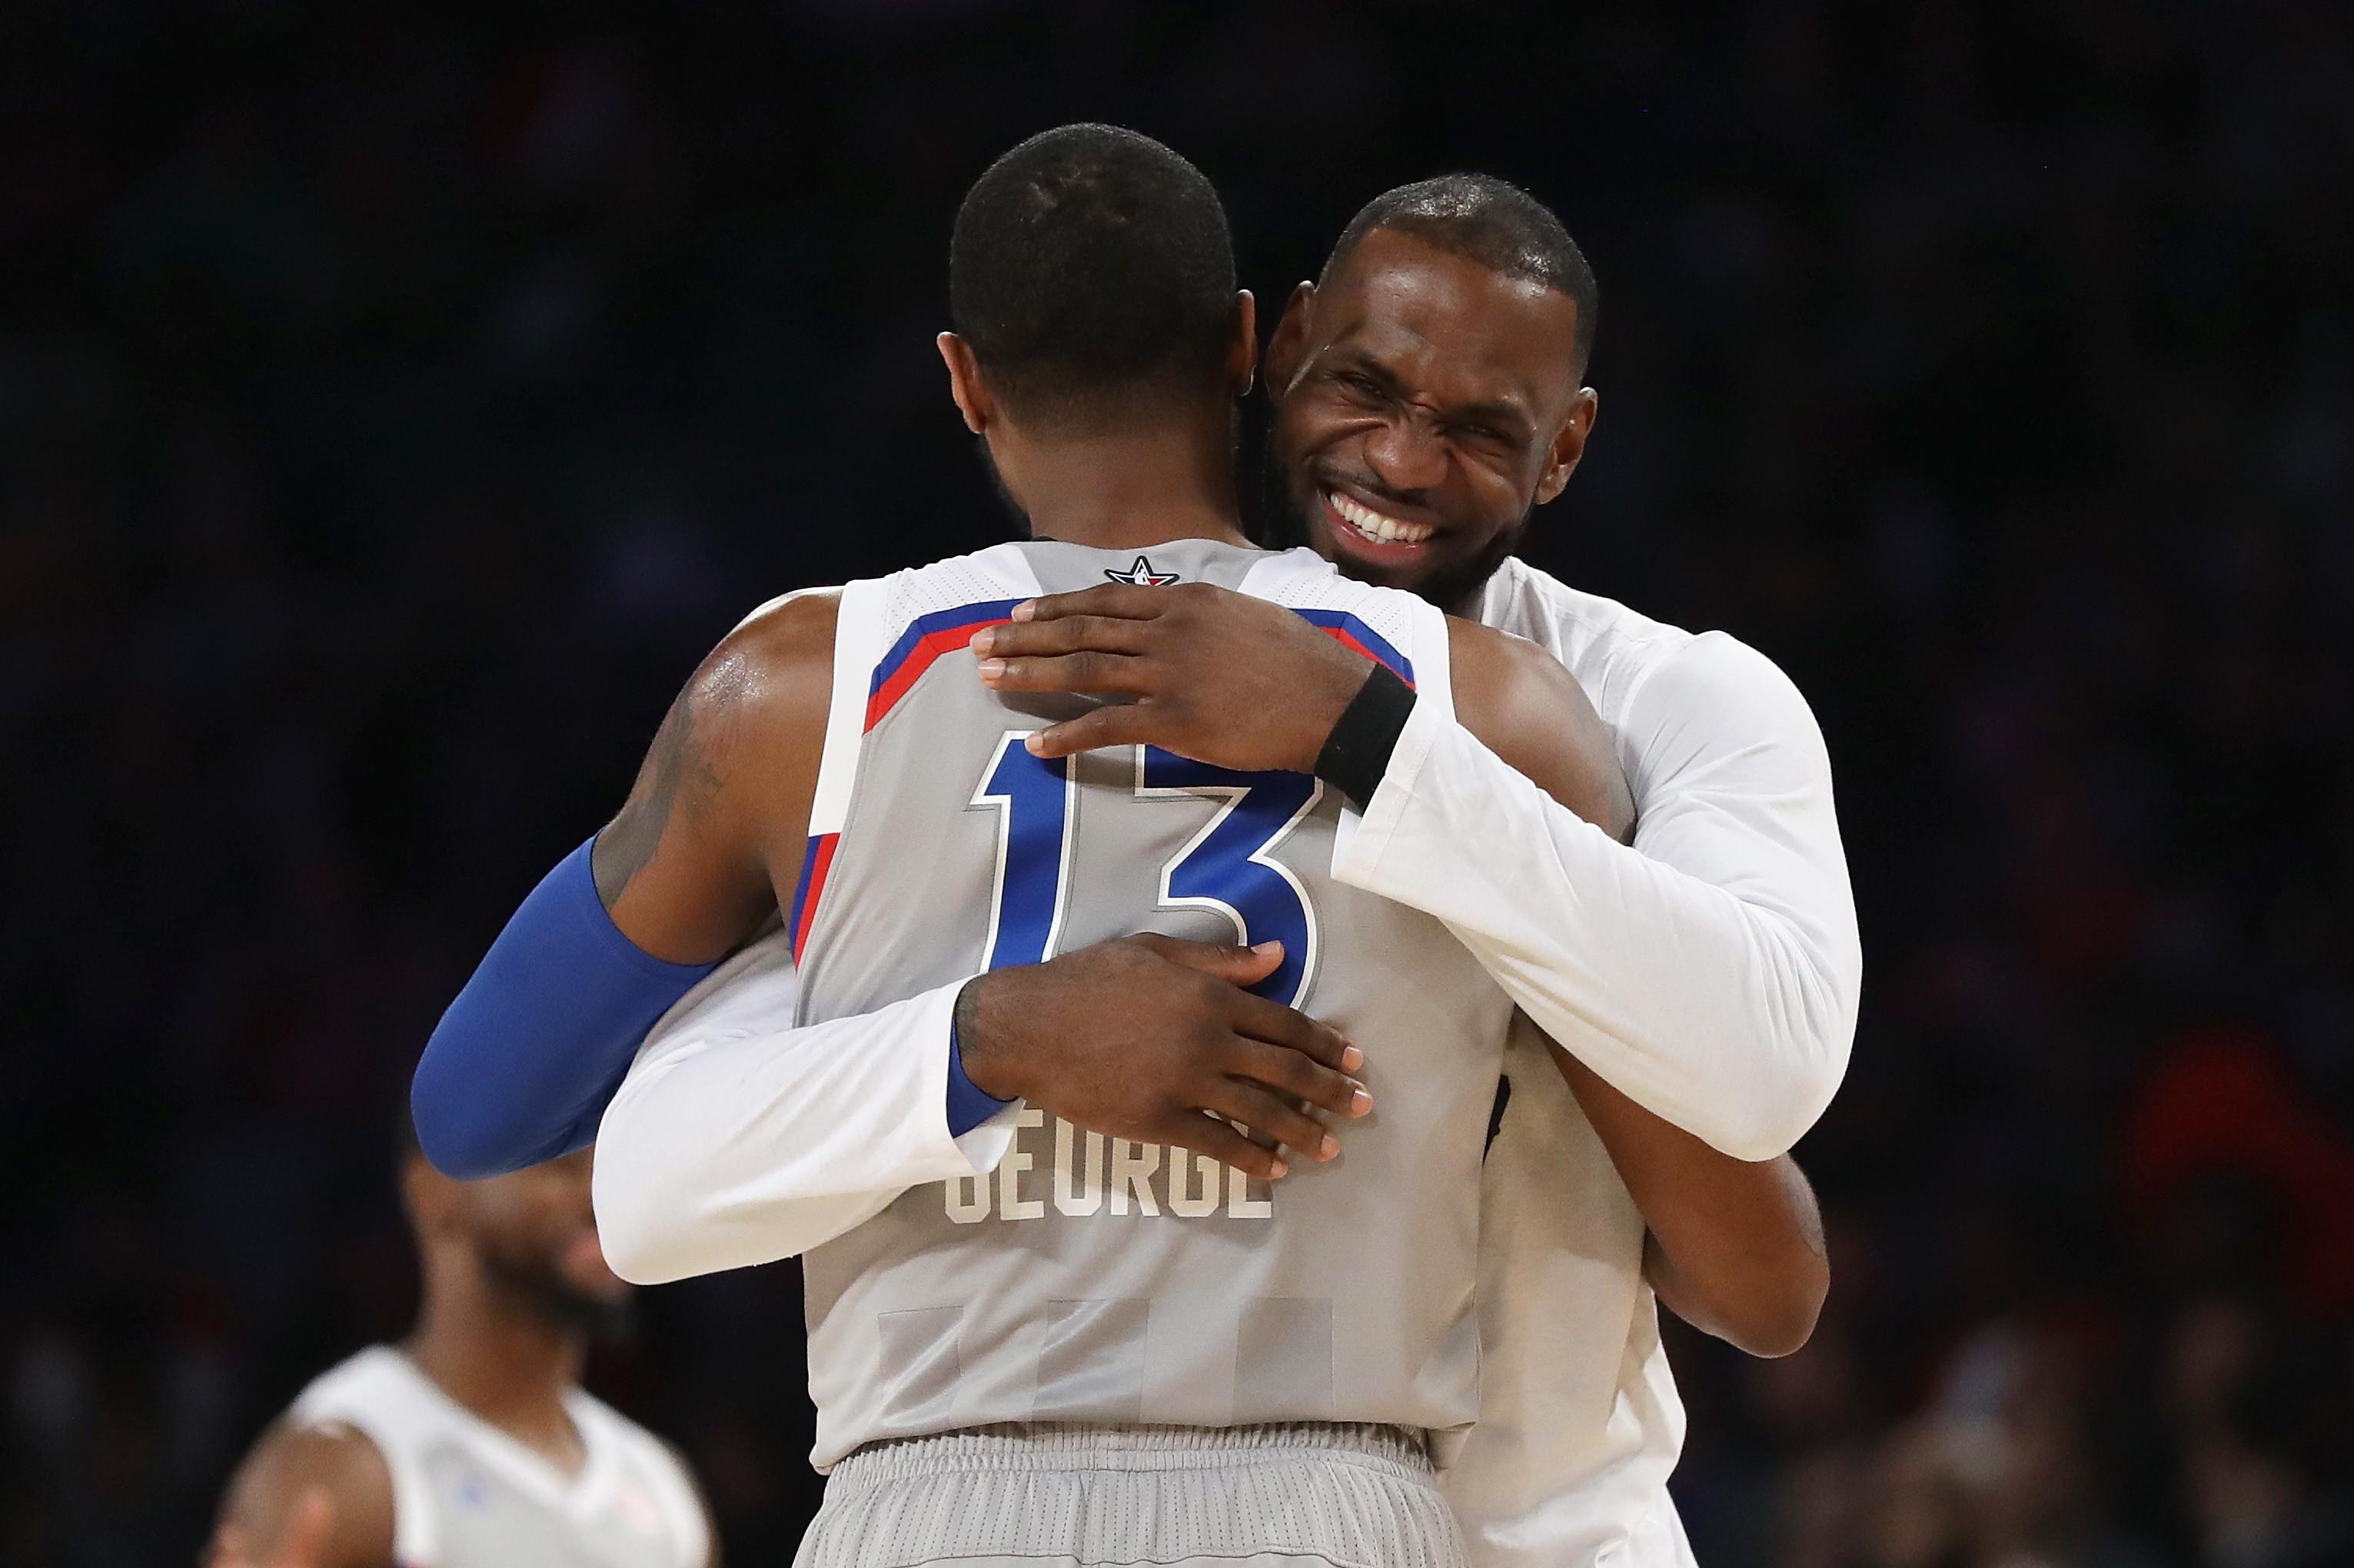 19 febbraio 2017: LeBron James abbraccia Paul George dopo l'All Star Game